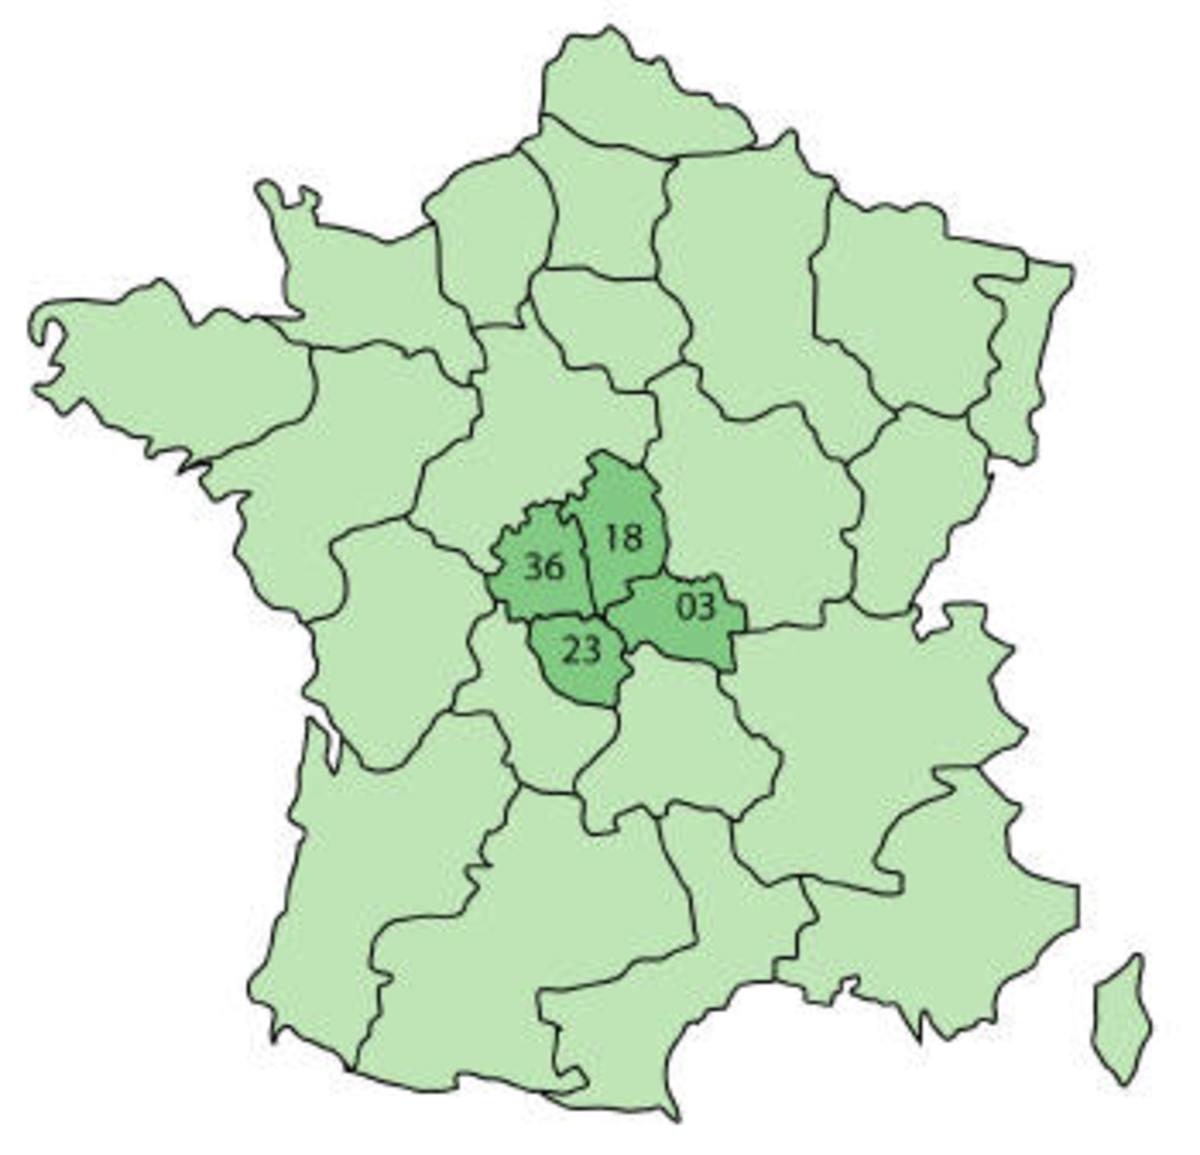 Central region 18 = Le Cher